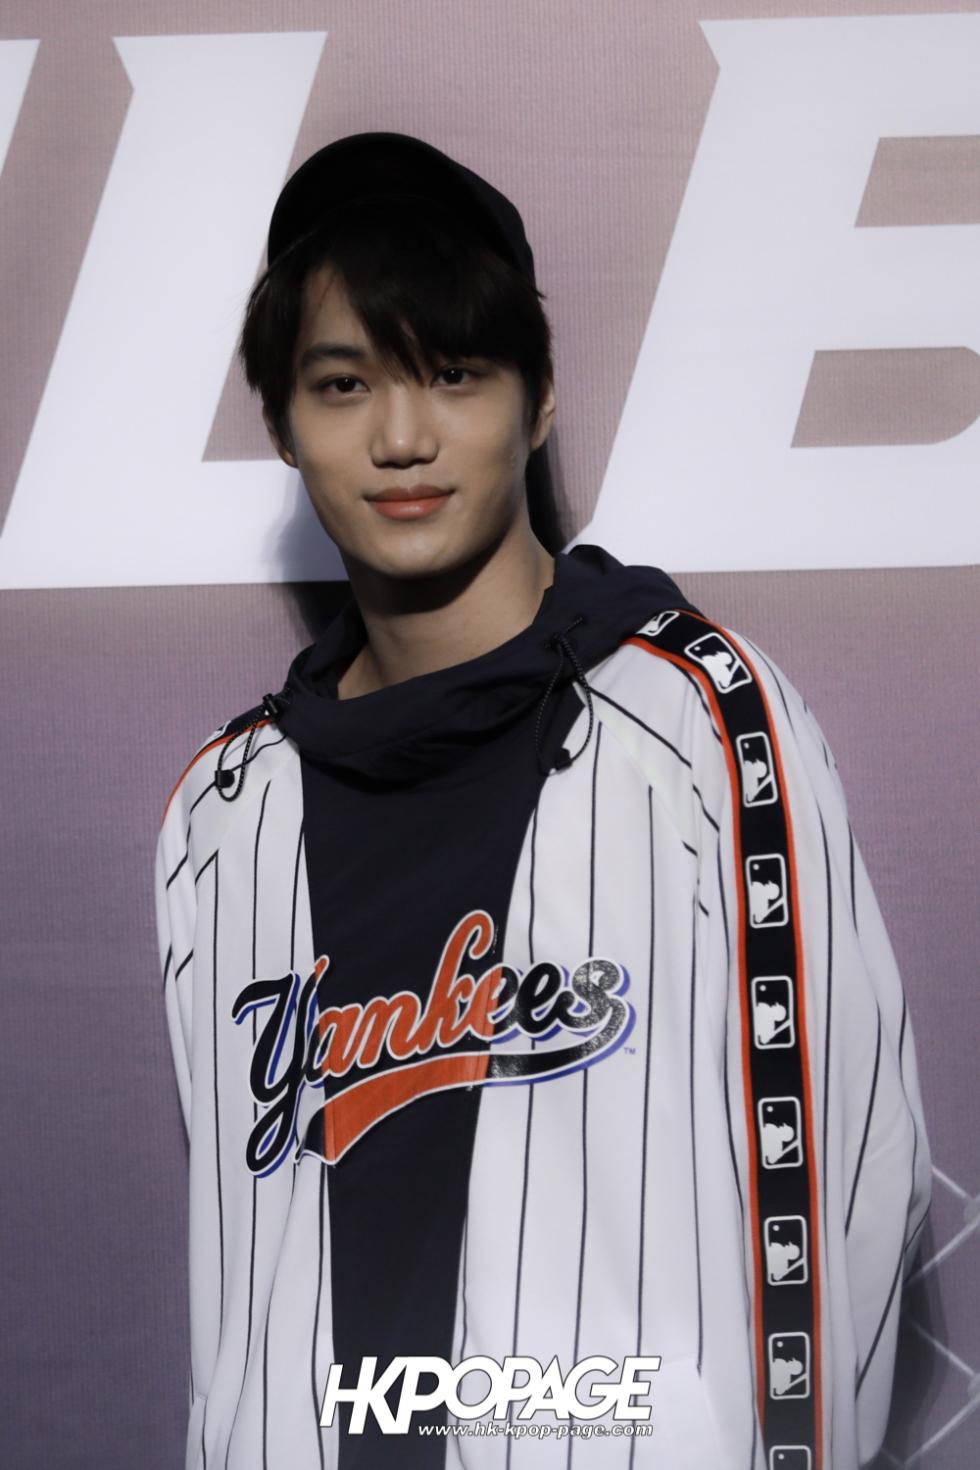 [HK.KPOP.PAGE] 180323_EXO_Chanyeol Kai Sehun_MLB Event_31